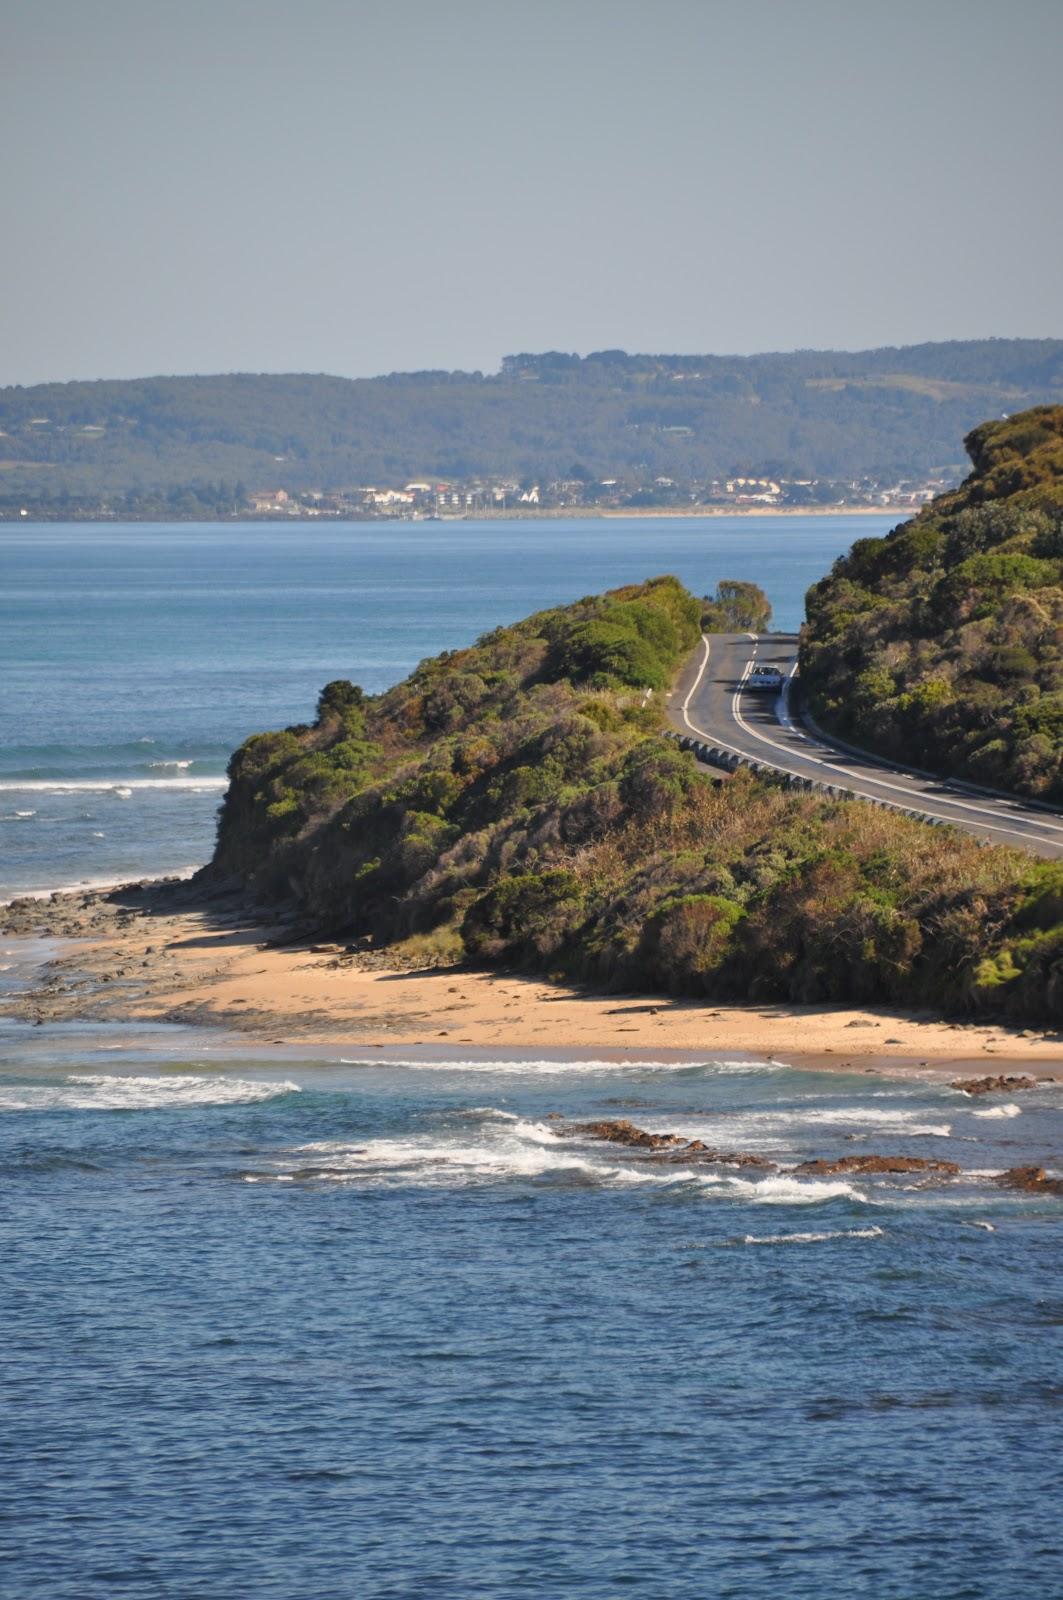 car on scenic coastal road near beach and blue ocean in australia great ocean road apollo bay in background. See the scenic great ocean road during our australia road trip itinerary.